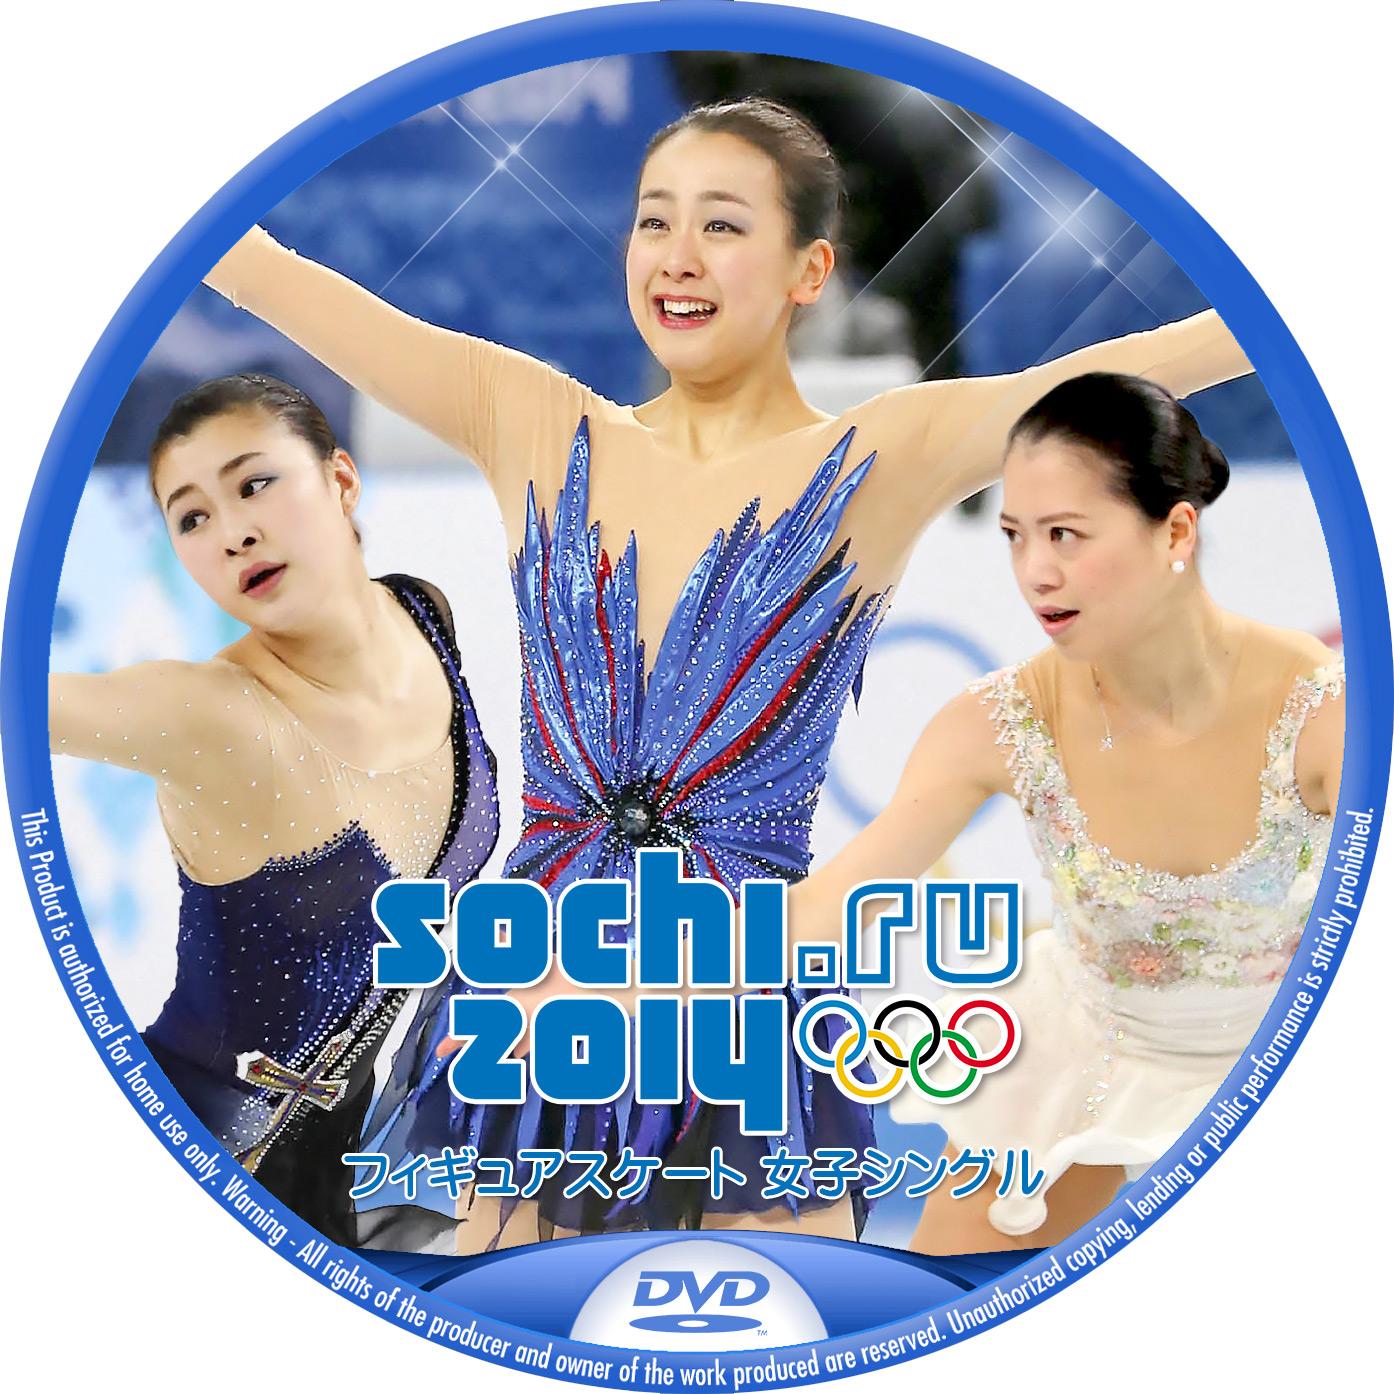 Sochi_Figure_Woens-DVD